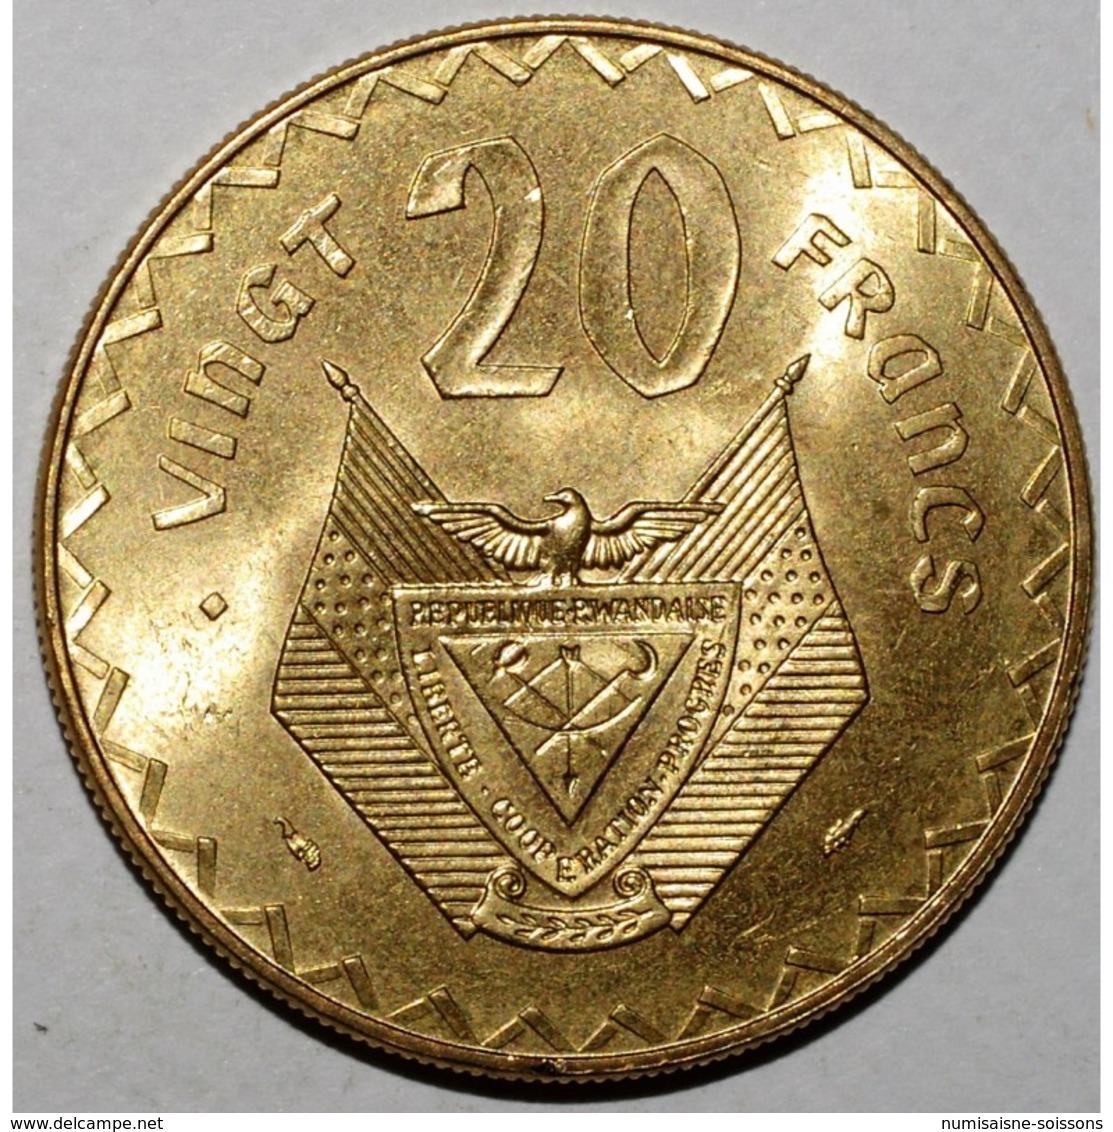 RWANDA - 20 FRANCS 1977 - FLEUR DE COIN - KM 15 - - Rwanda